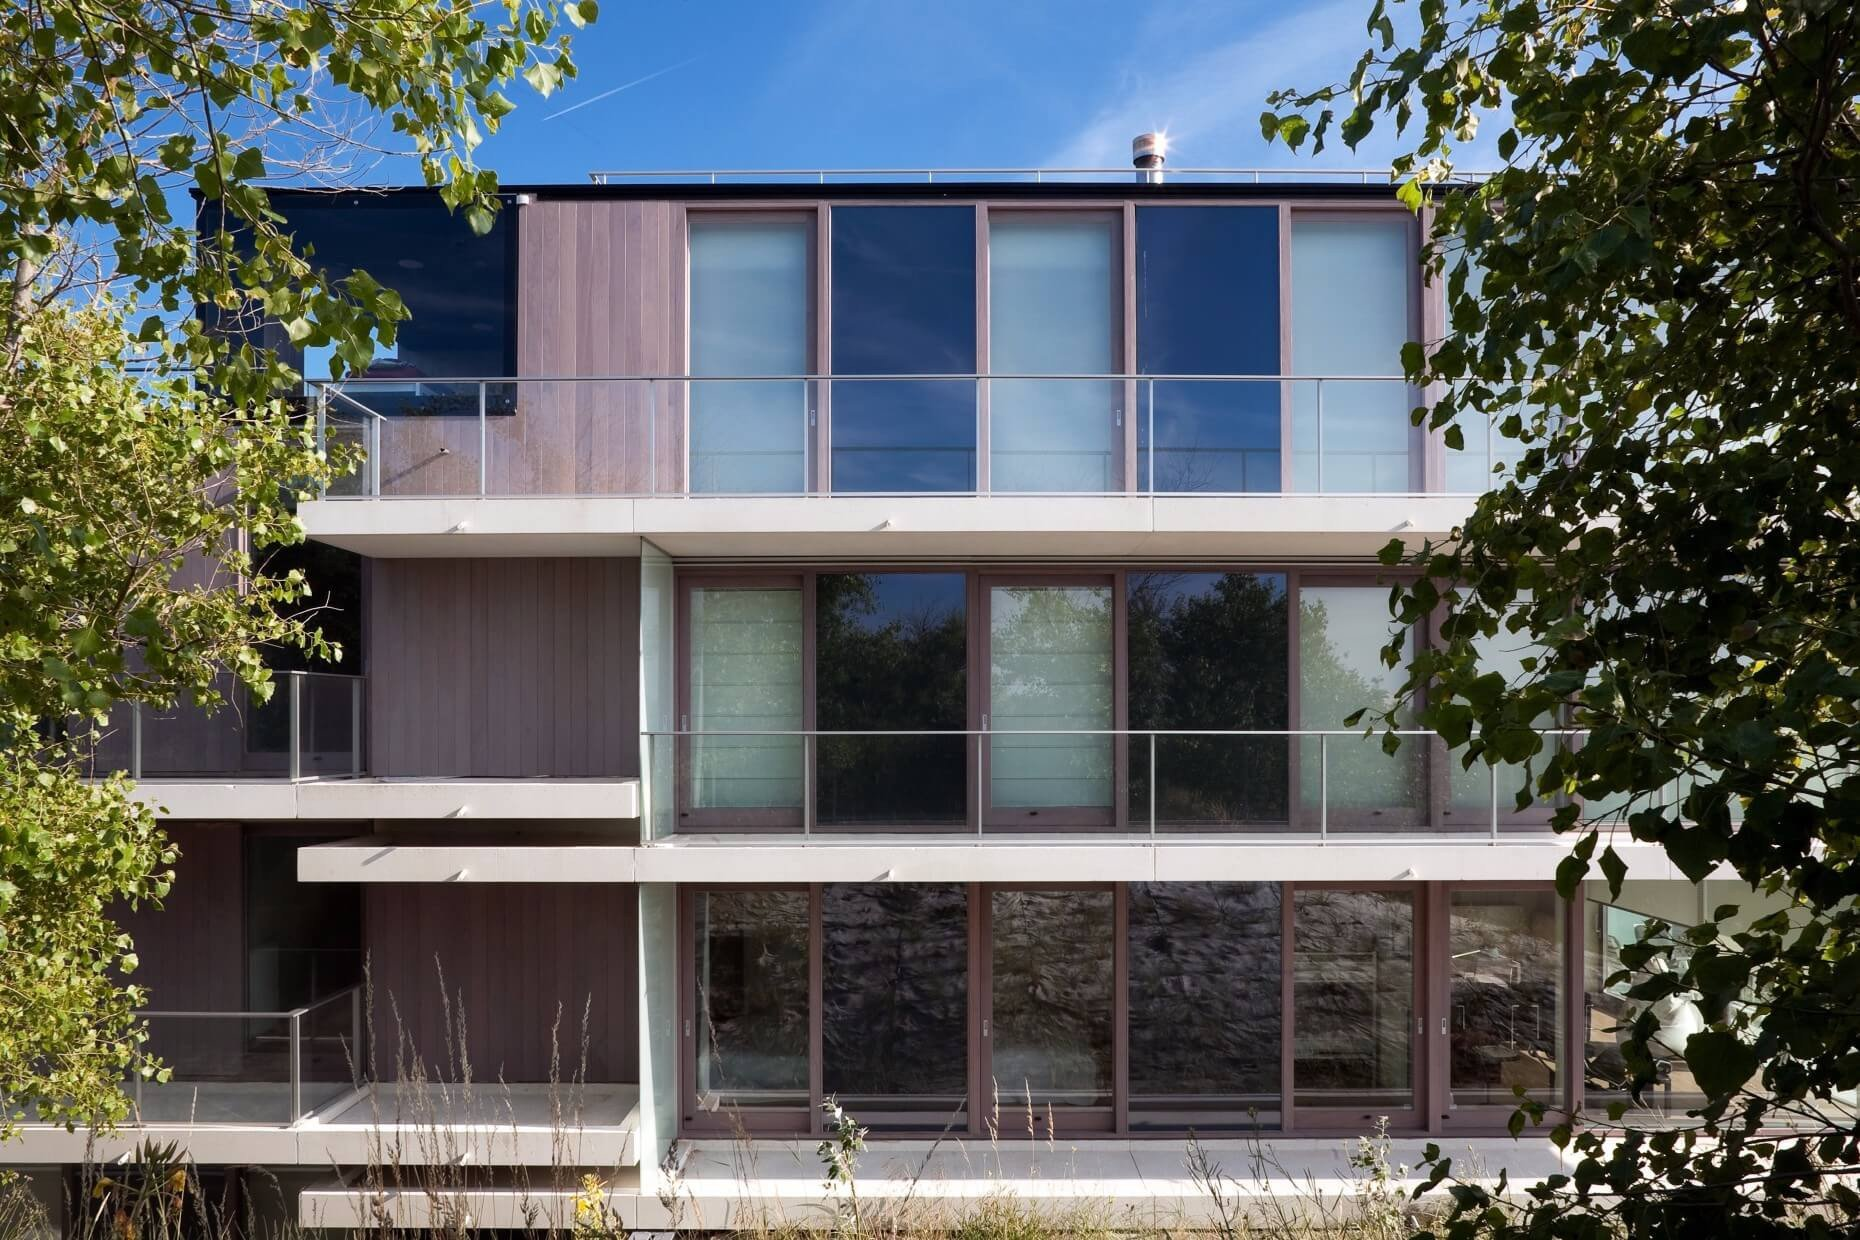 Rietveldprojects-Periscoop-appartement-design-architectuur-kust23